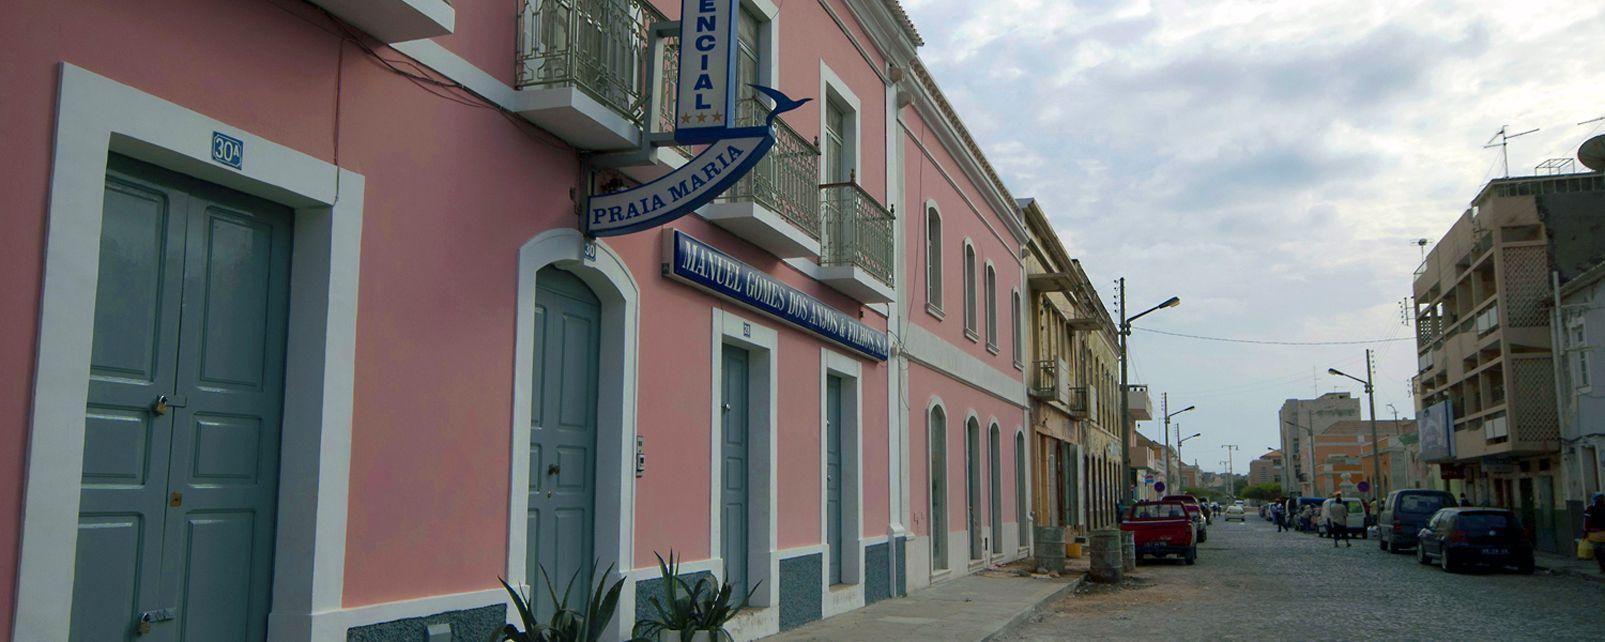 Hôtel Pension Praia Maria